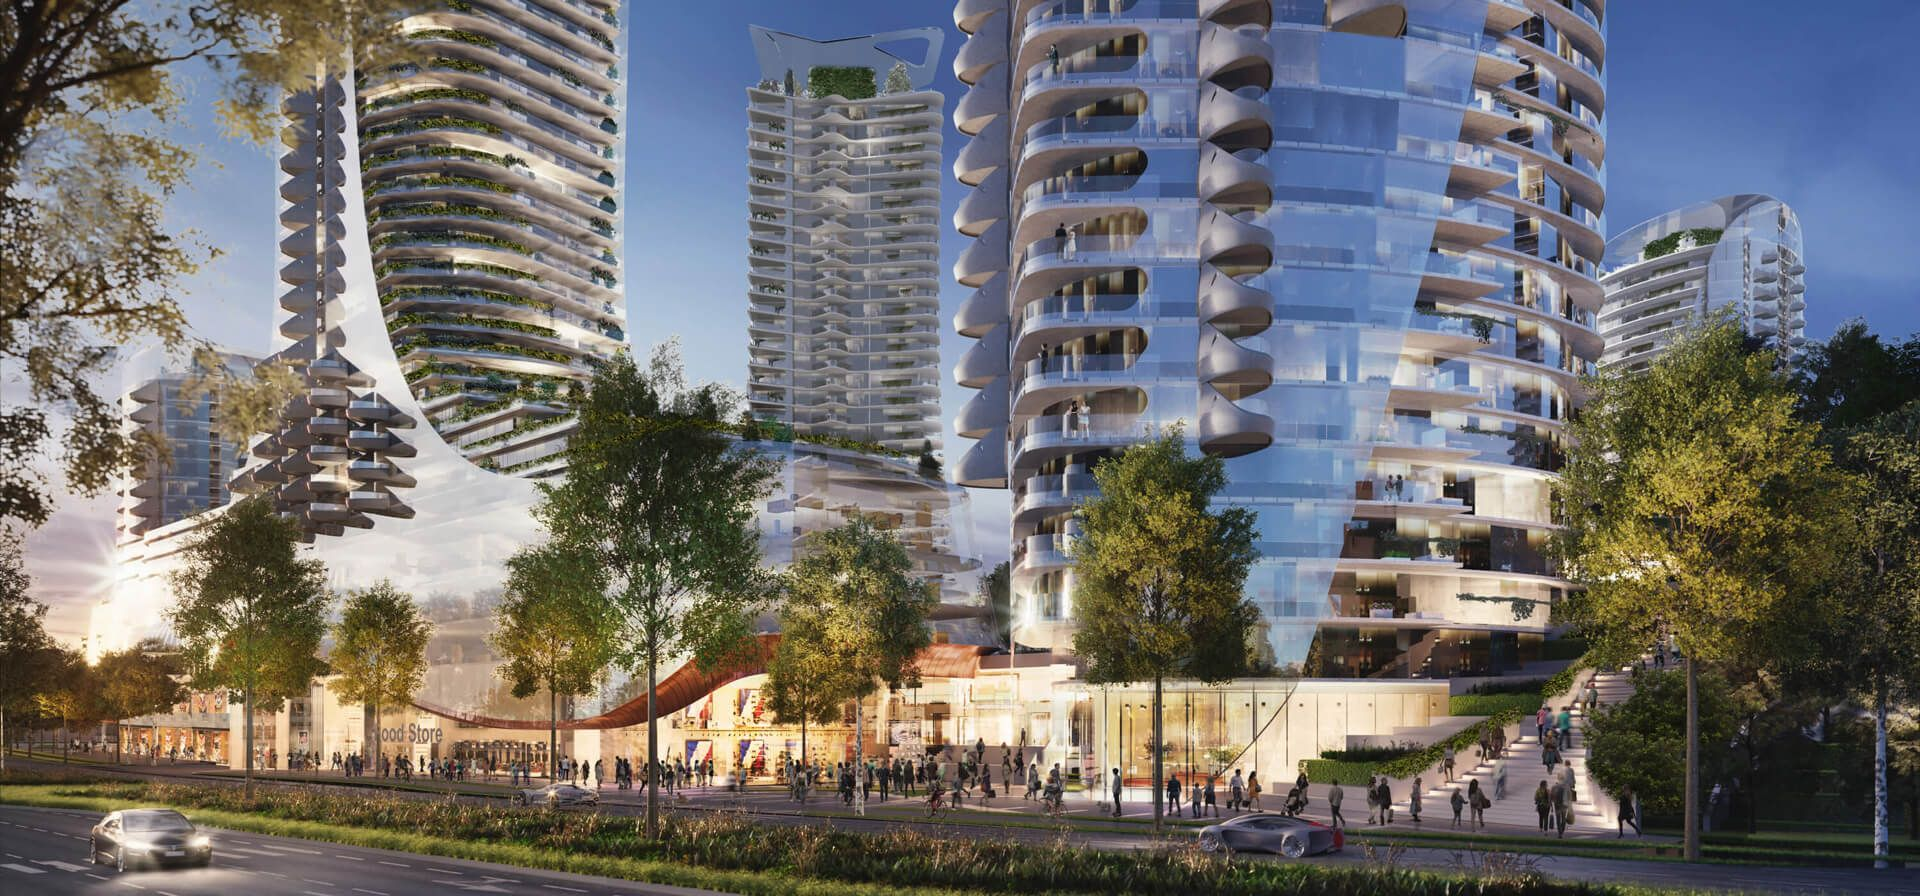 Prestigious Development Oakridge Vancouver Launches Hong Kong Pop-Up Exhibition